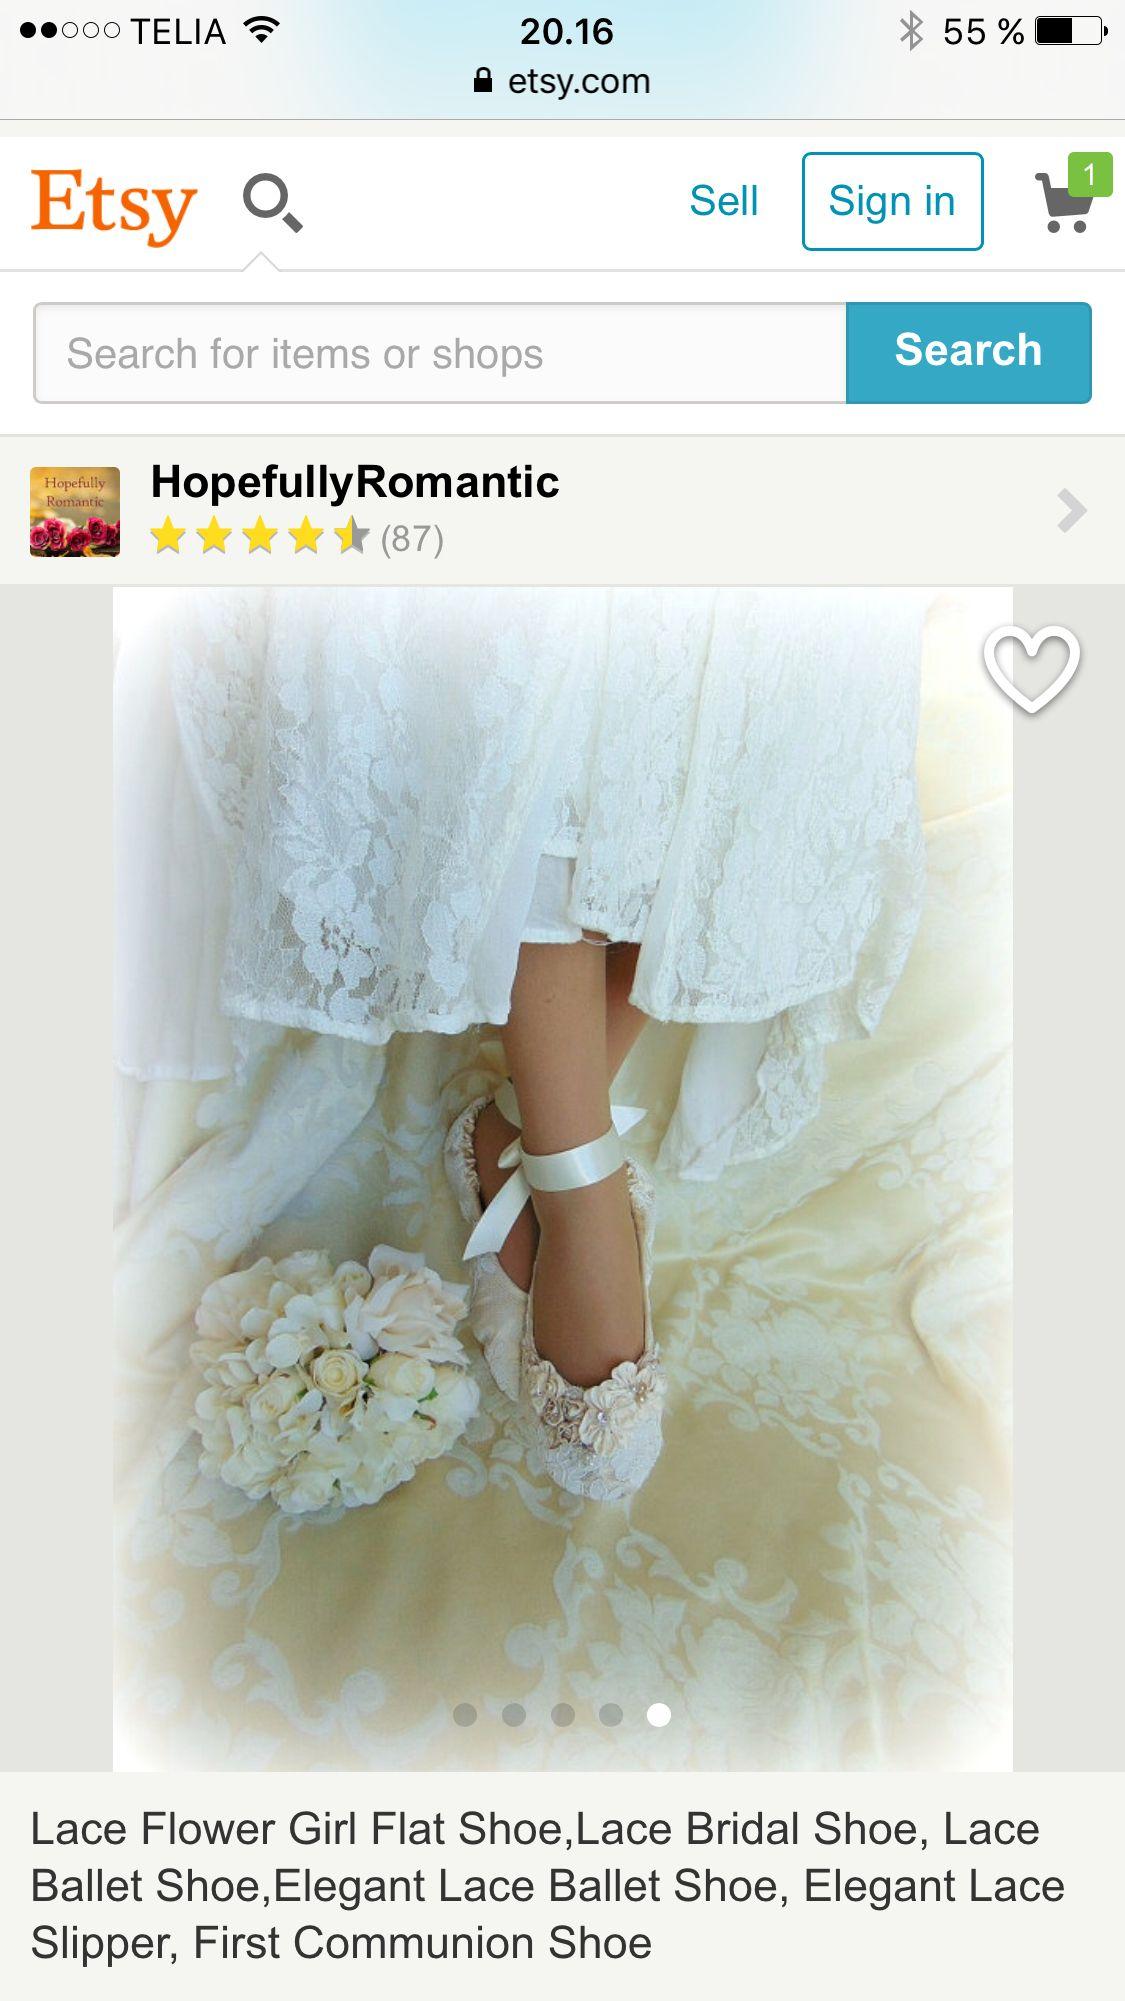 Wedding Ballet flats etsy https://www.etsy.com/dk-en/listing/230542551/lace-flower-girl-flat-shoelace-bridal